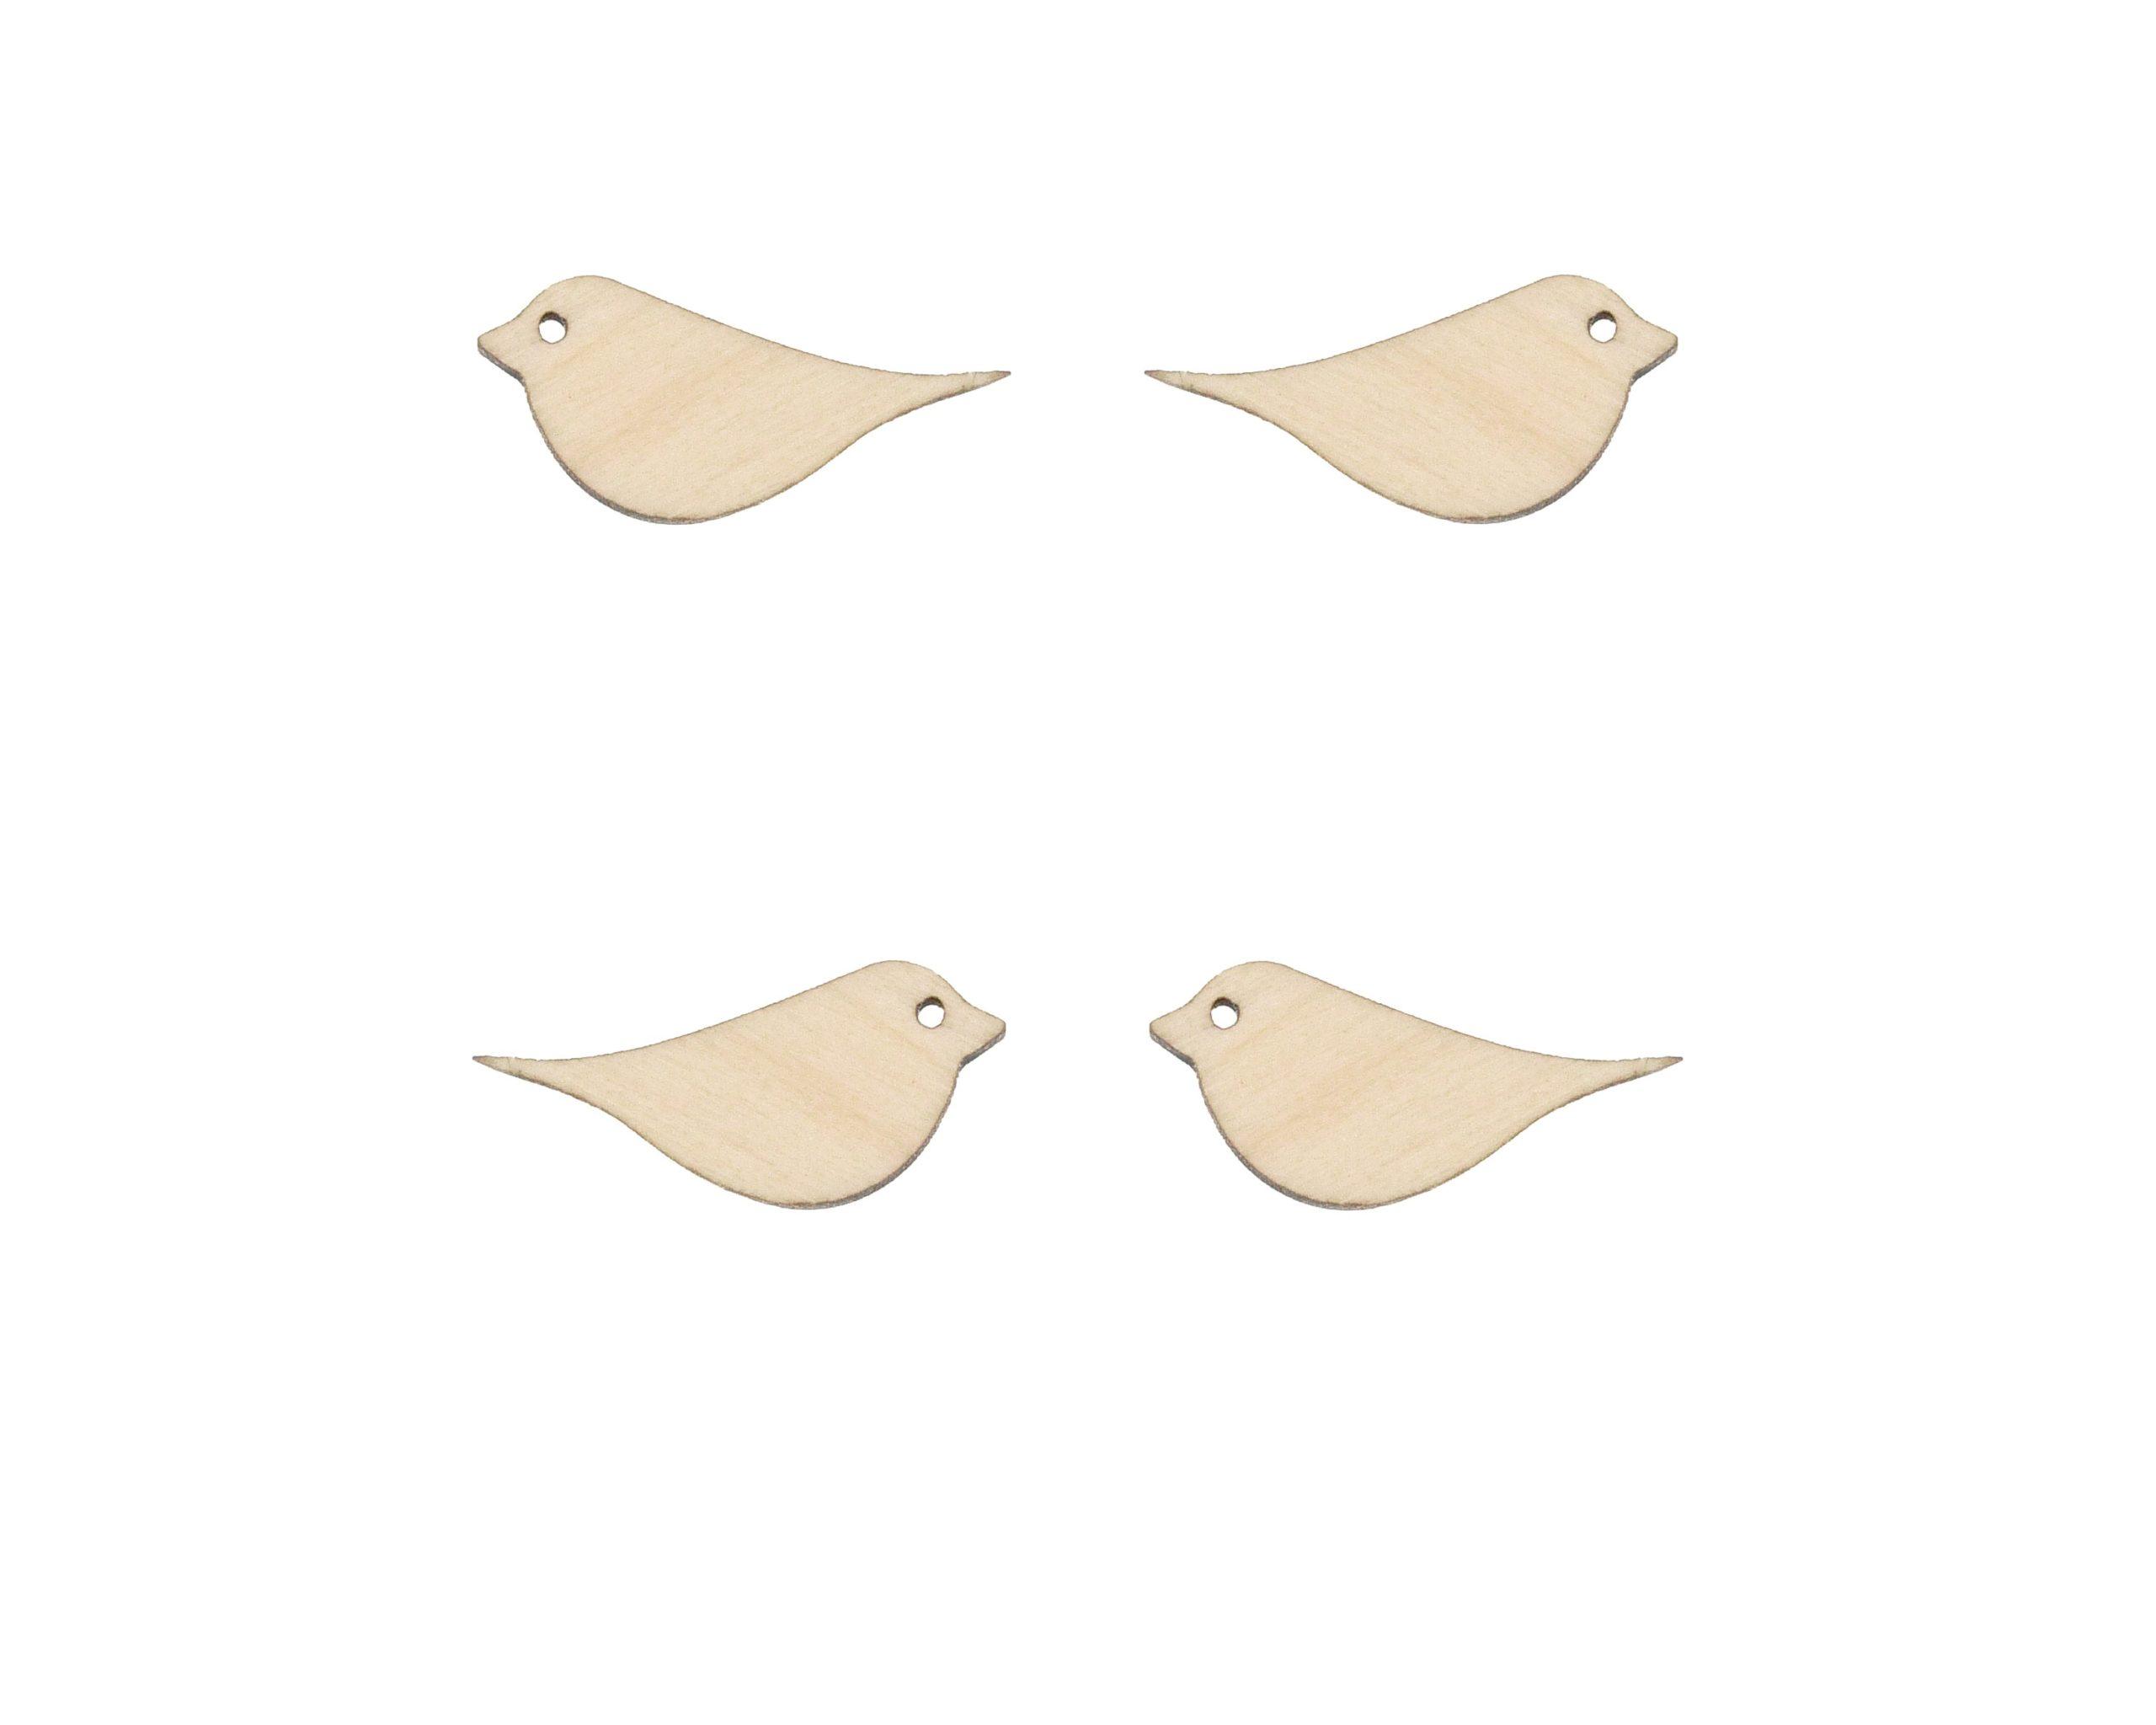 Birds Blank Wood Cabochons